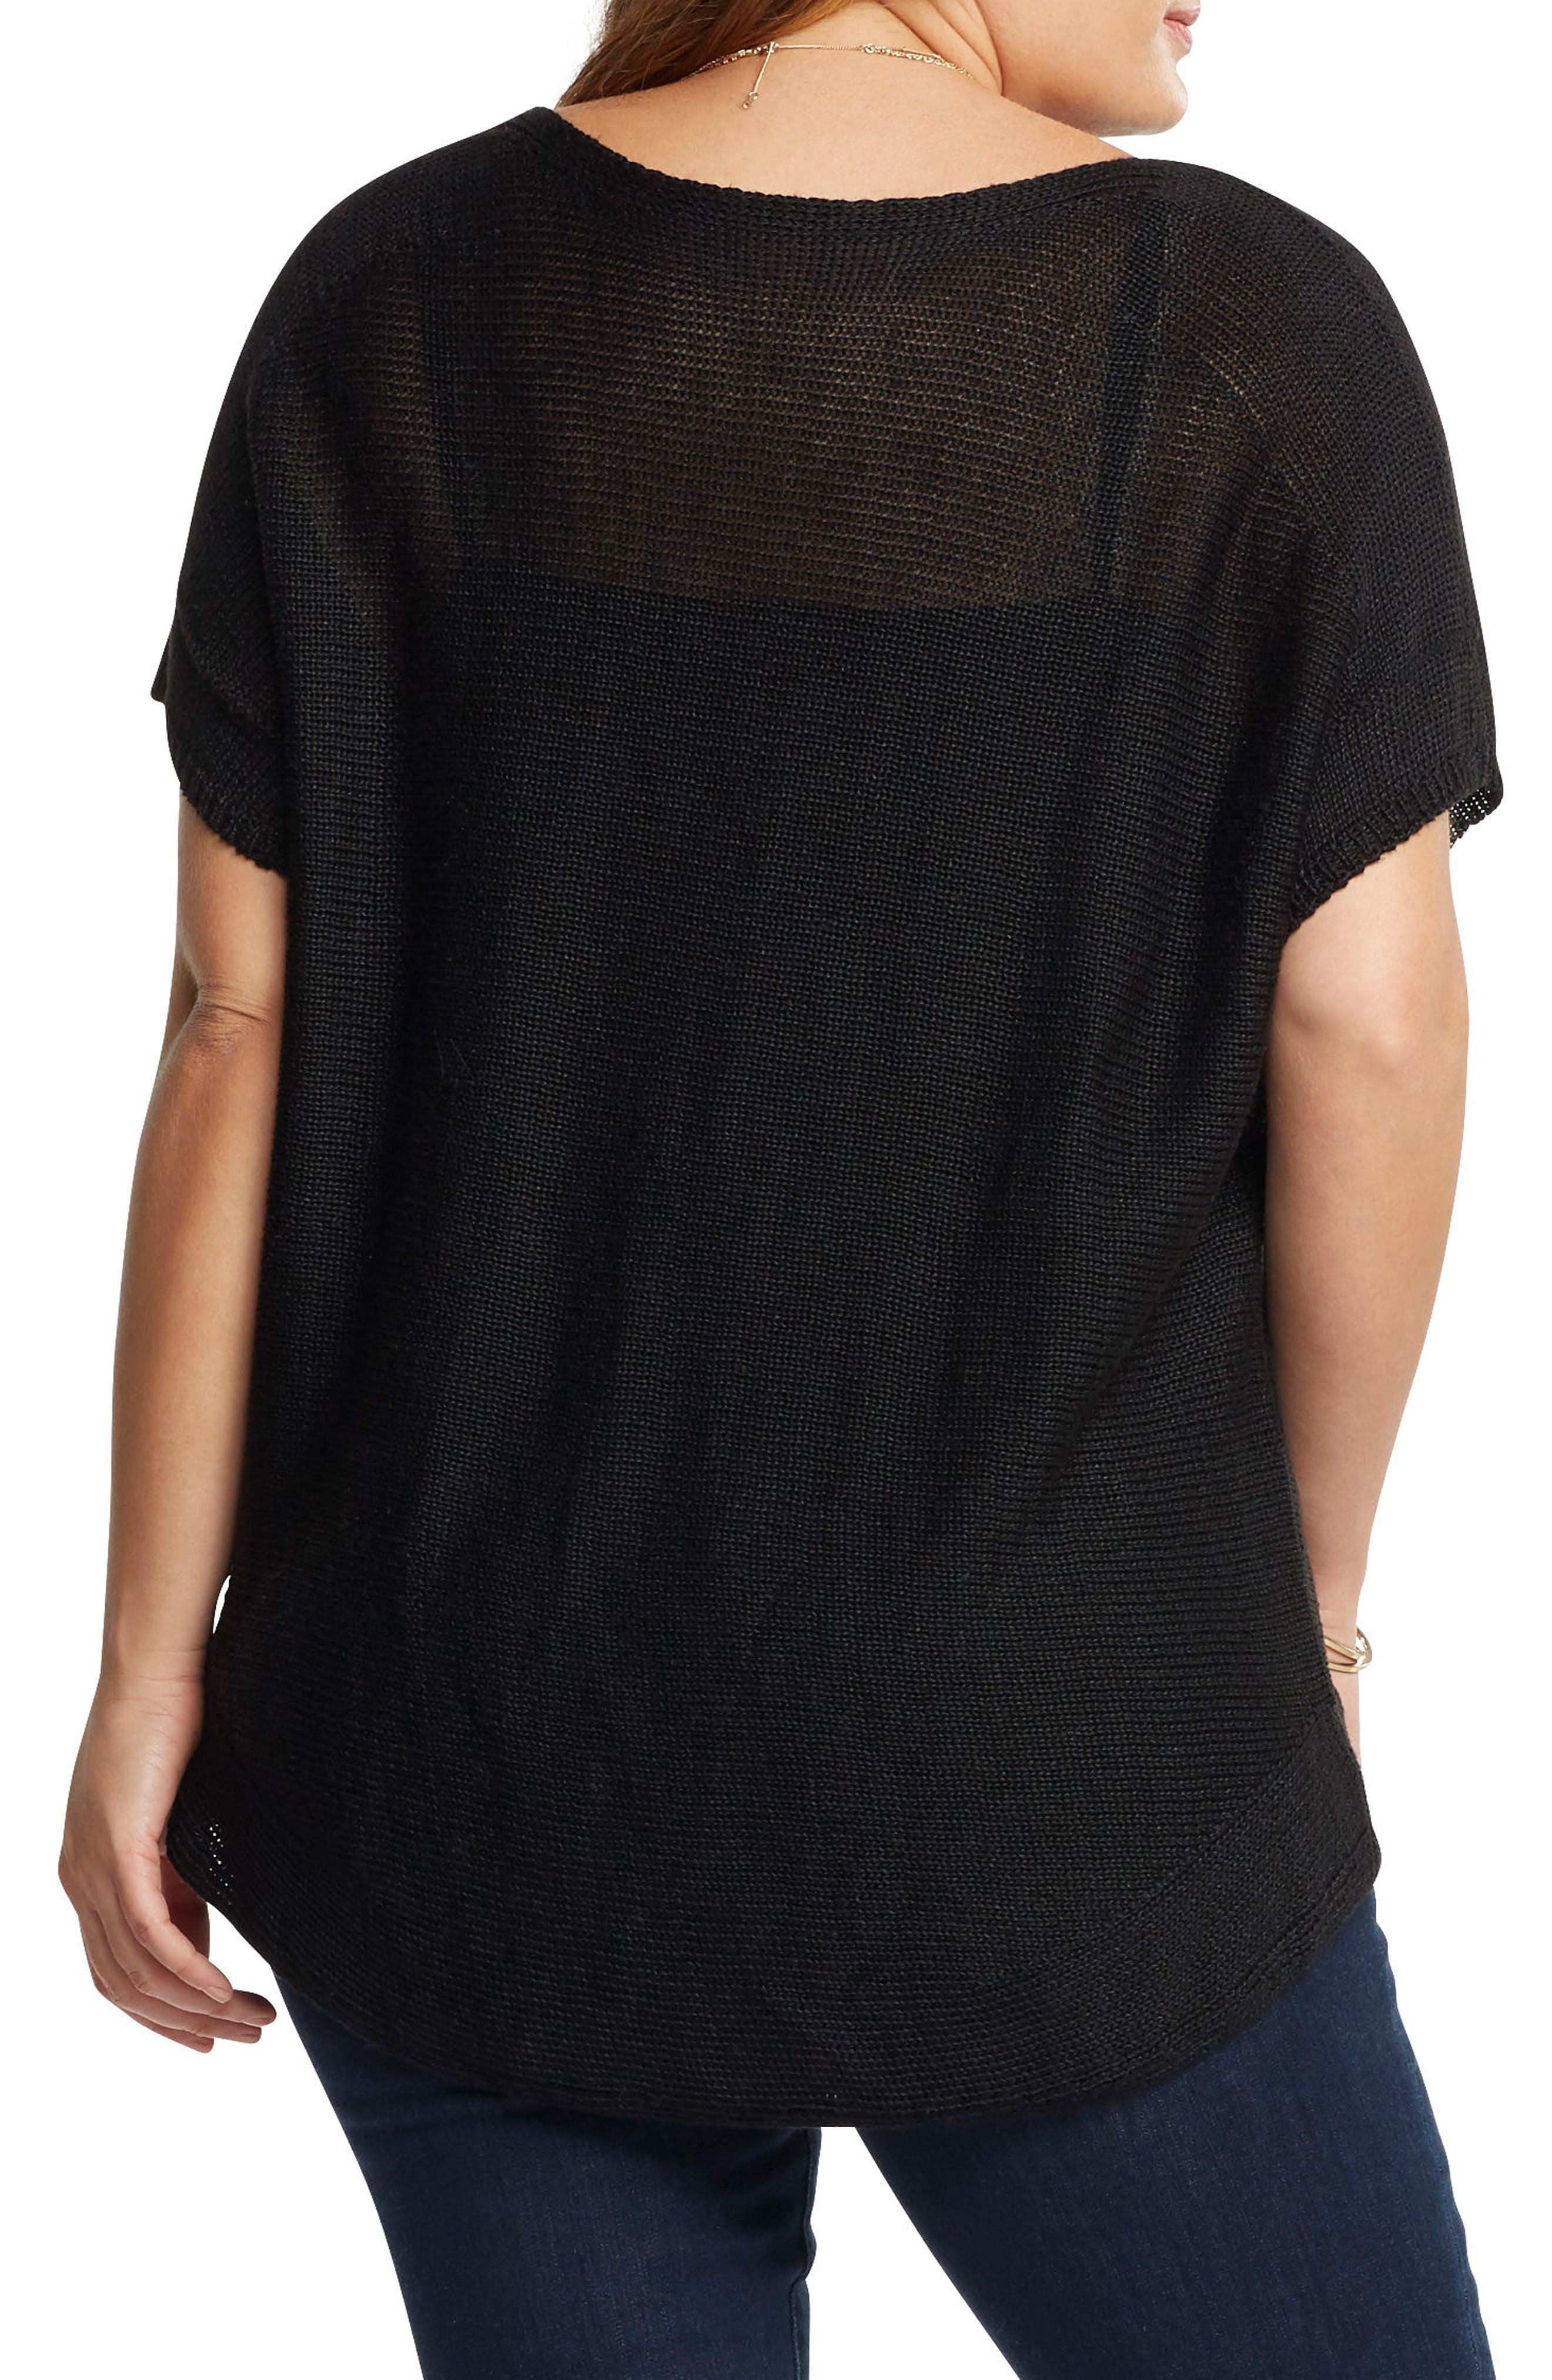 Padma Linen Blend Sweater,                             Alternate thumbnail 2, color,                             Black